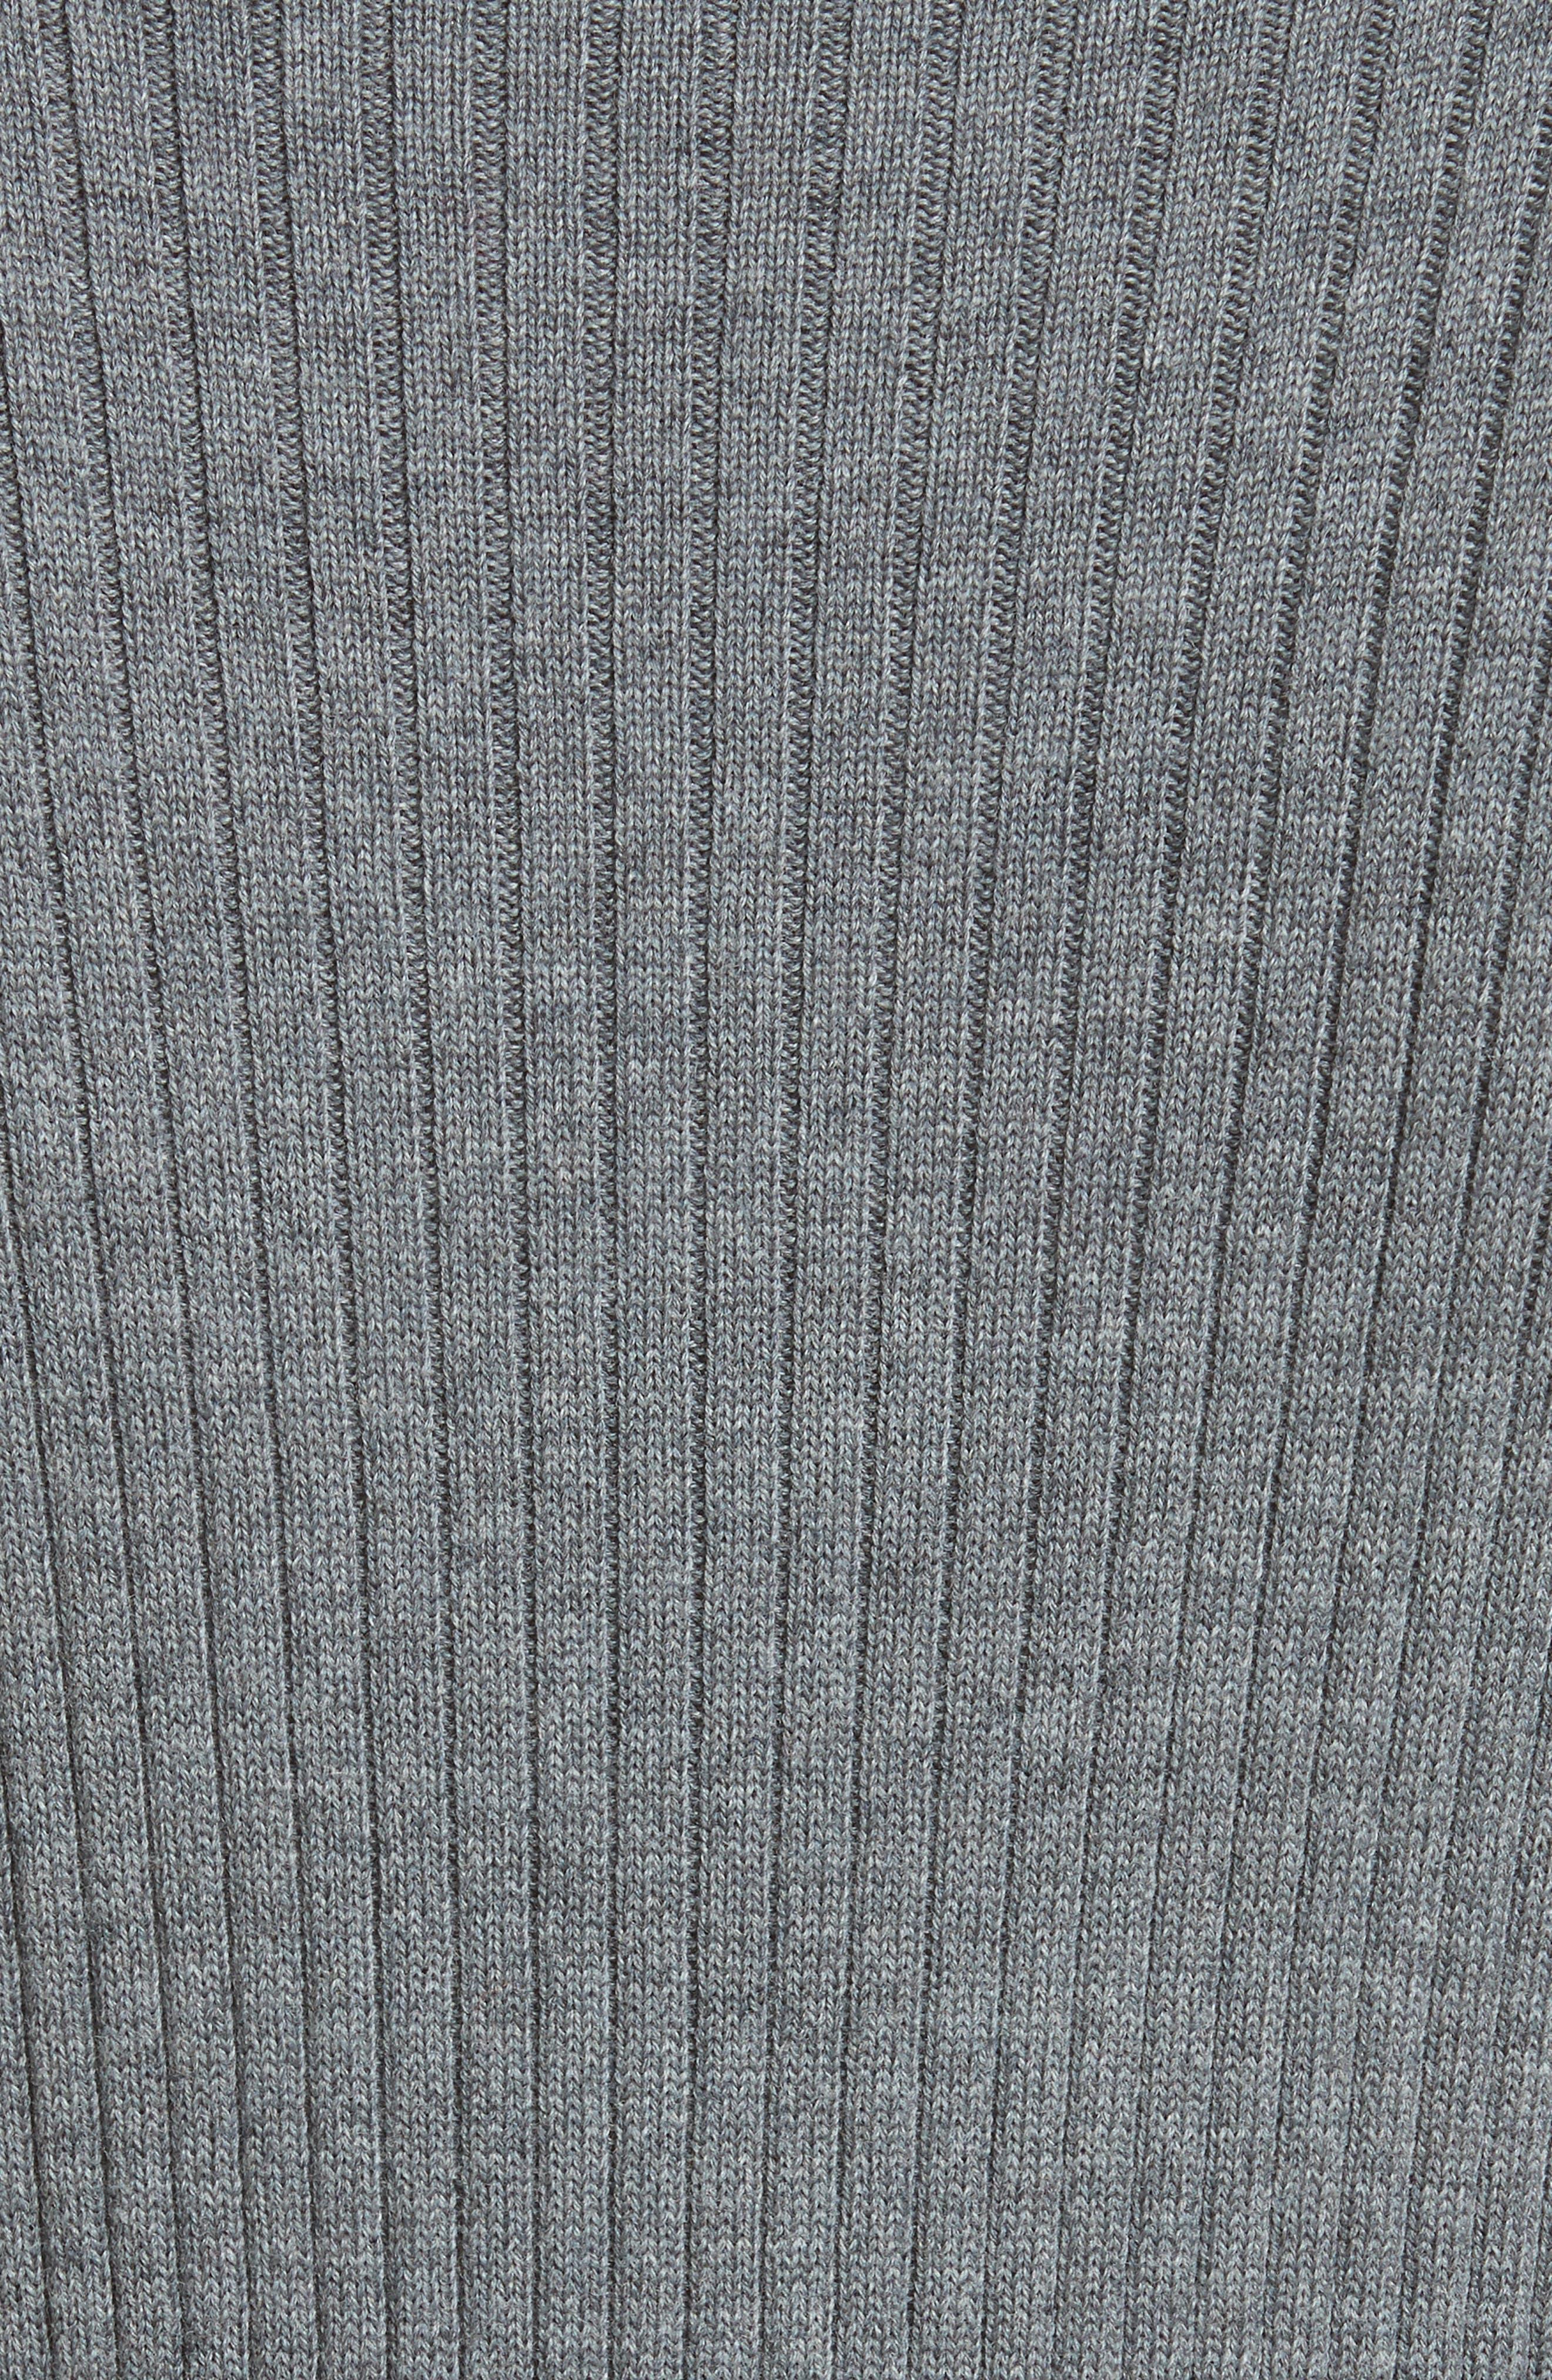 Asymmetrical Rib Knit Top,                             Alternate thumbnail 6, color,                             Flint Melange